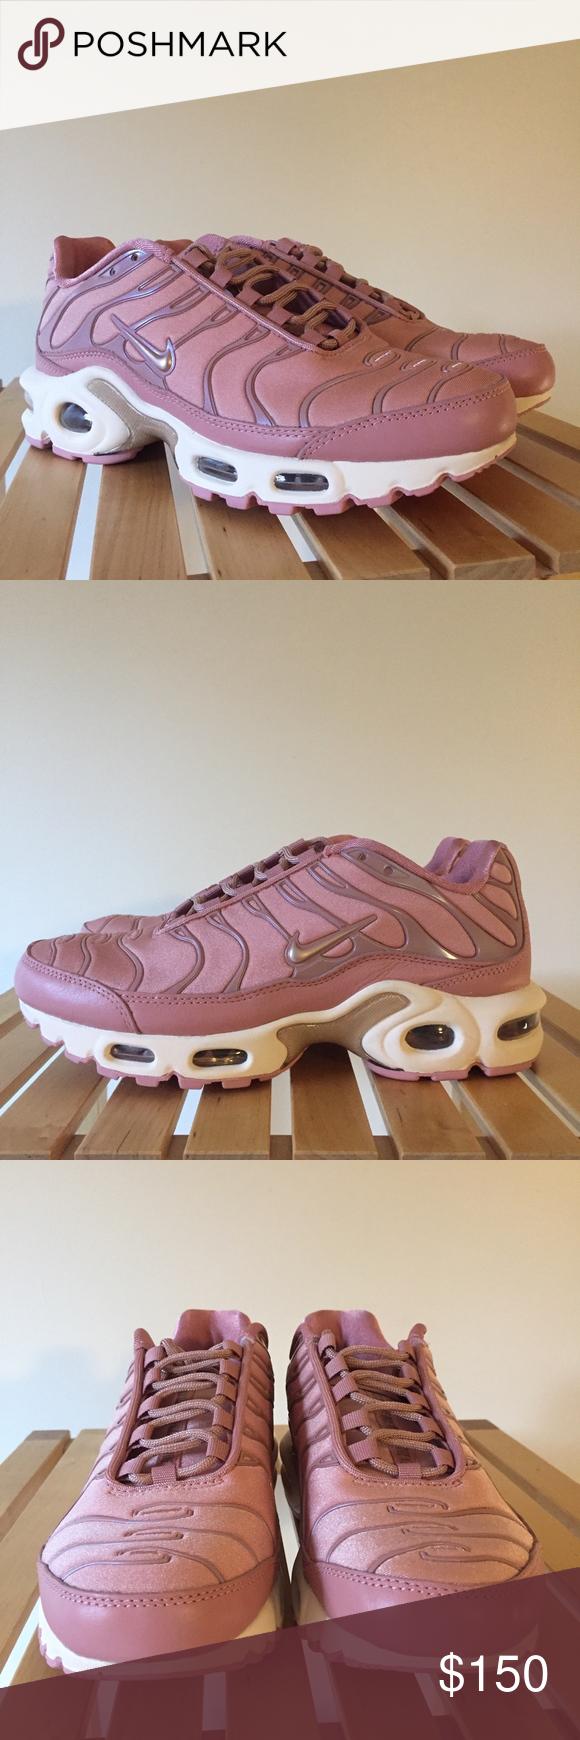 Nike Wmns Air Max Plus Rust Pink AT5695